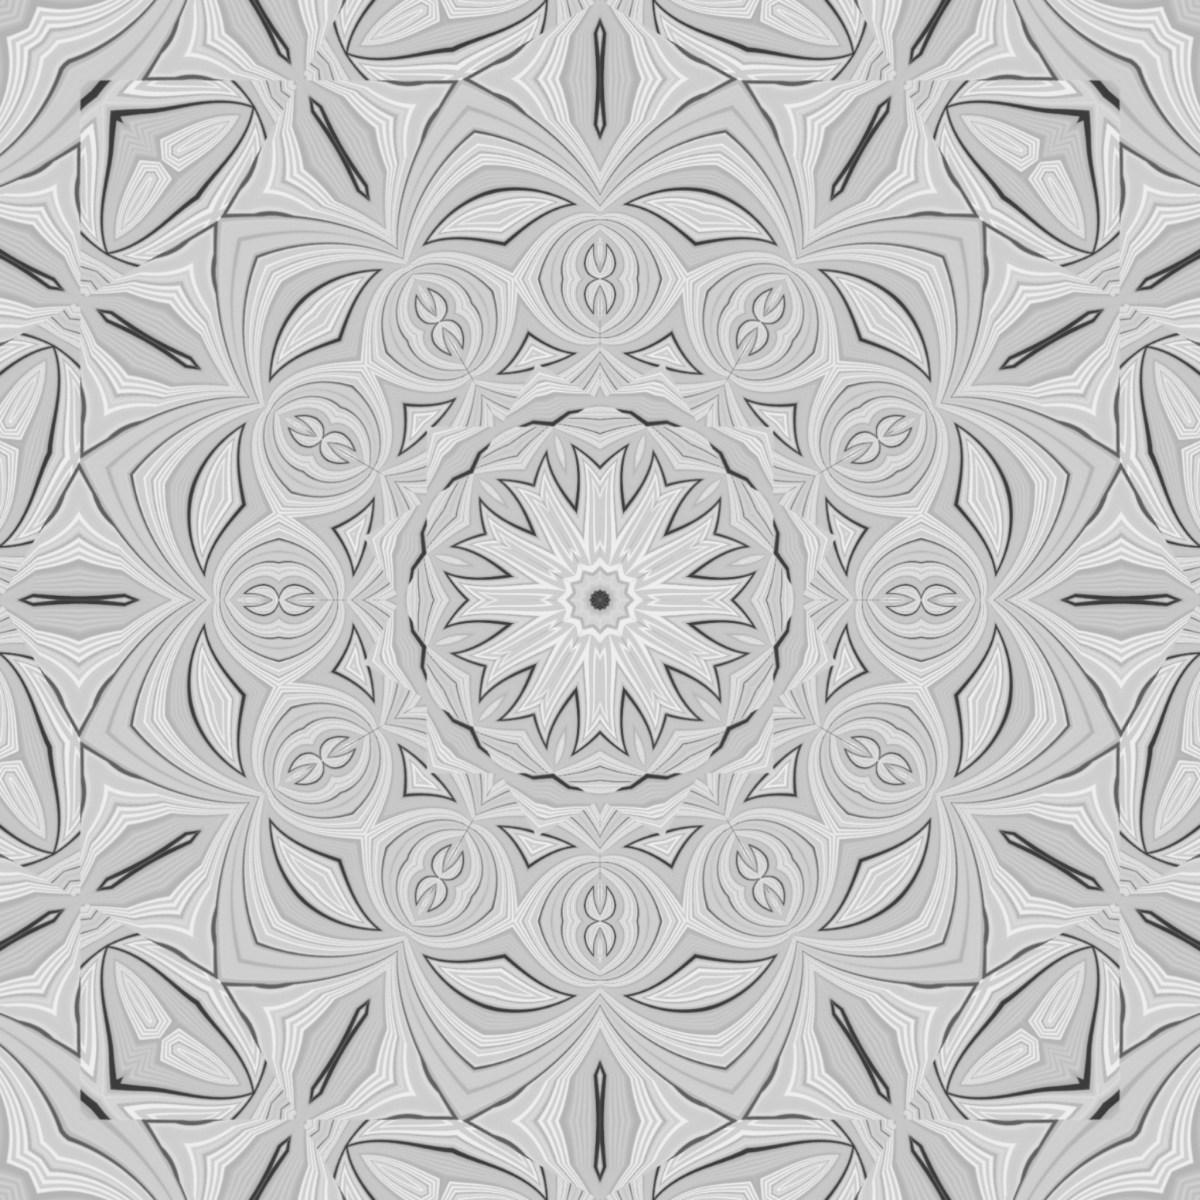 Kalidoscopic Monochrome Eye glitch art